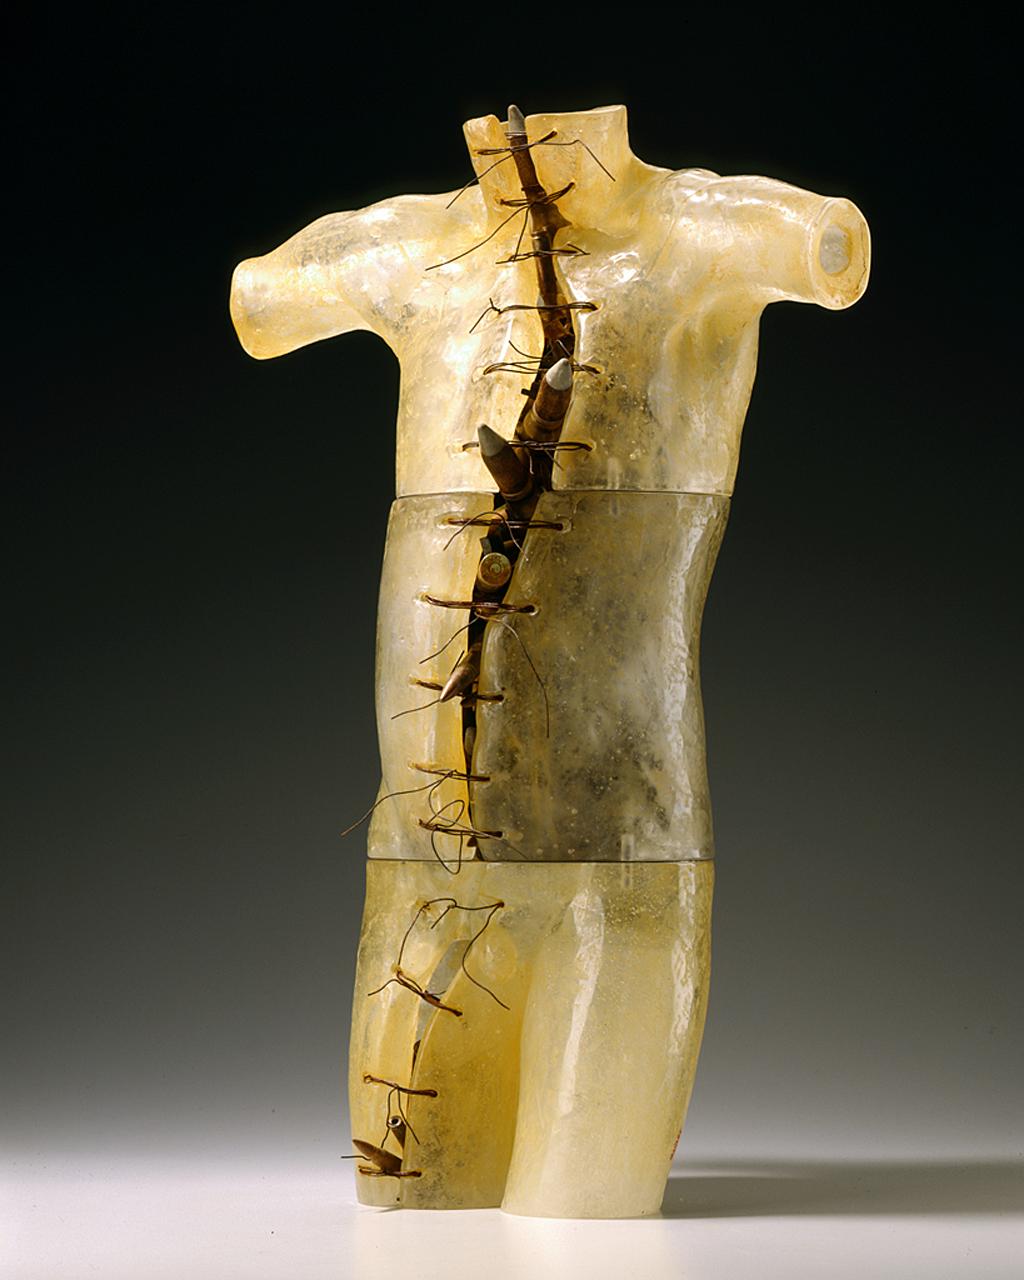 War Boy - Job No. 1, 2006: Clifford Rainey. Glass, inert ammunition, iron wire, oxides, pins, maple plinth. Photo: Lee Fatherree